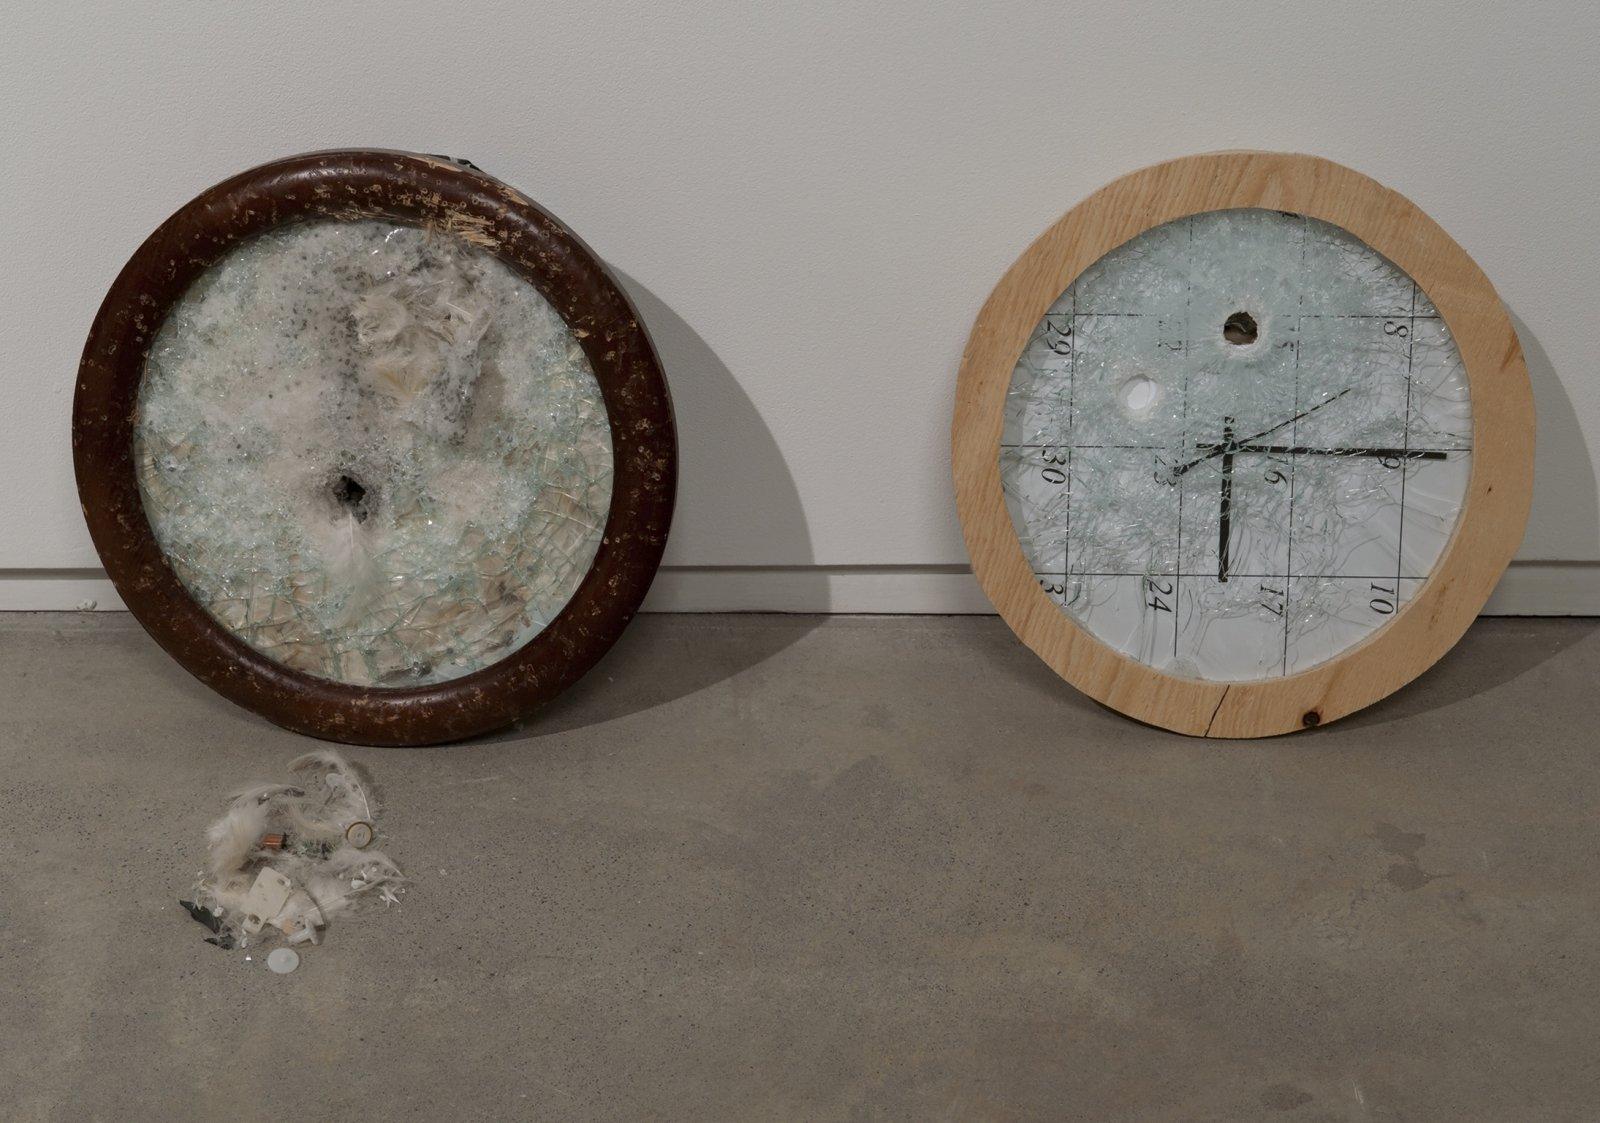 Julia Feyrer, Shot, 2012, Dated, 2012 by Julia Feyrer